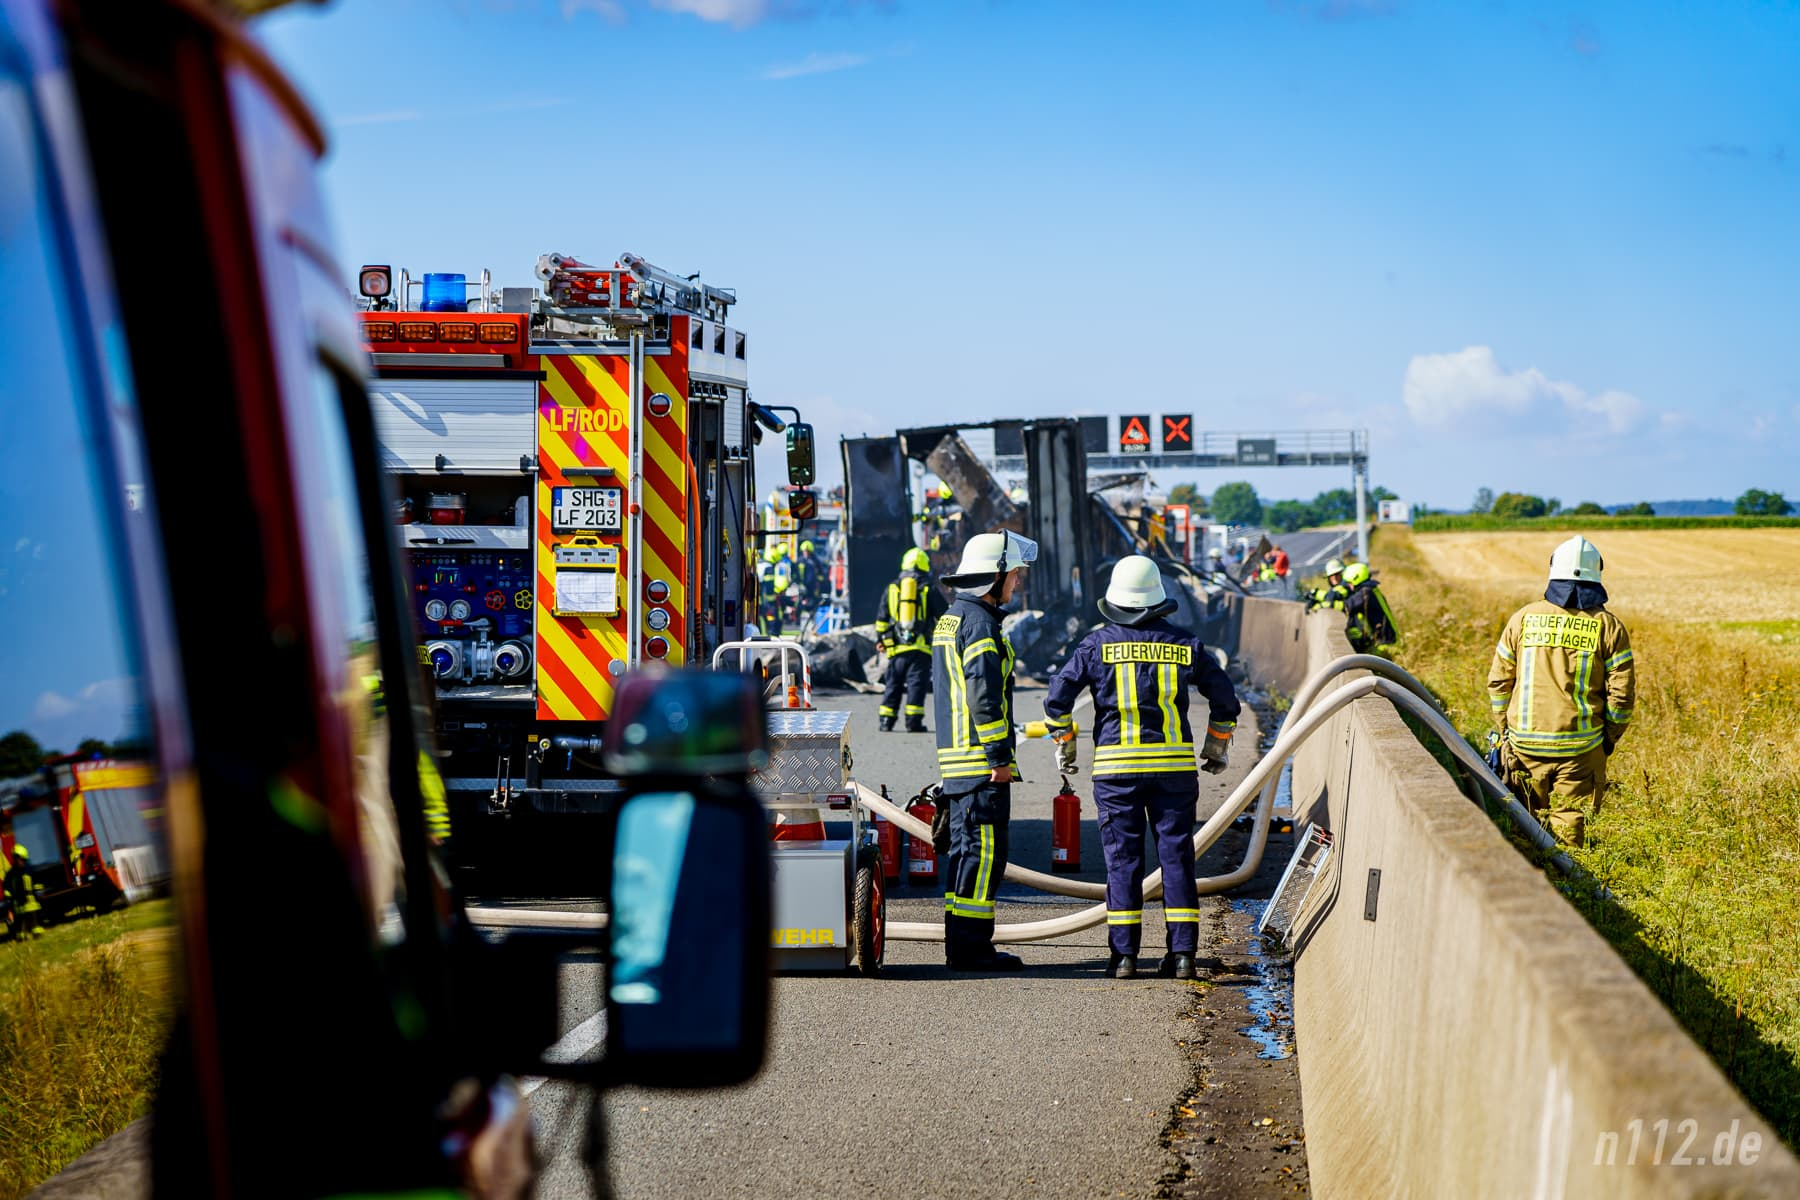 Großaufgebot an der Autobahn 2 (Foto: n112.de/Stefan Simonsen)